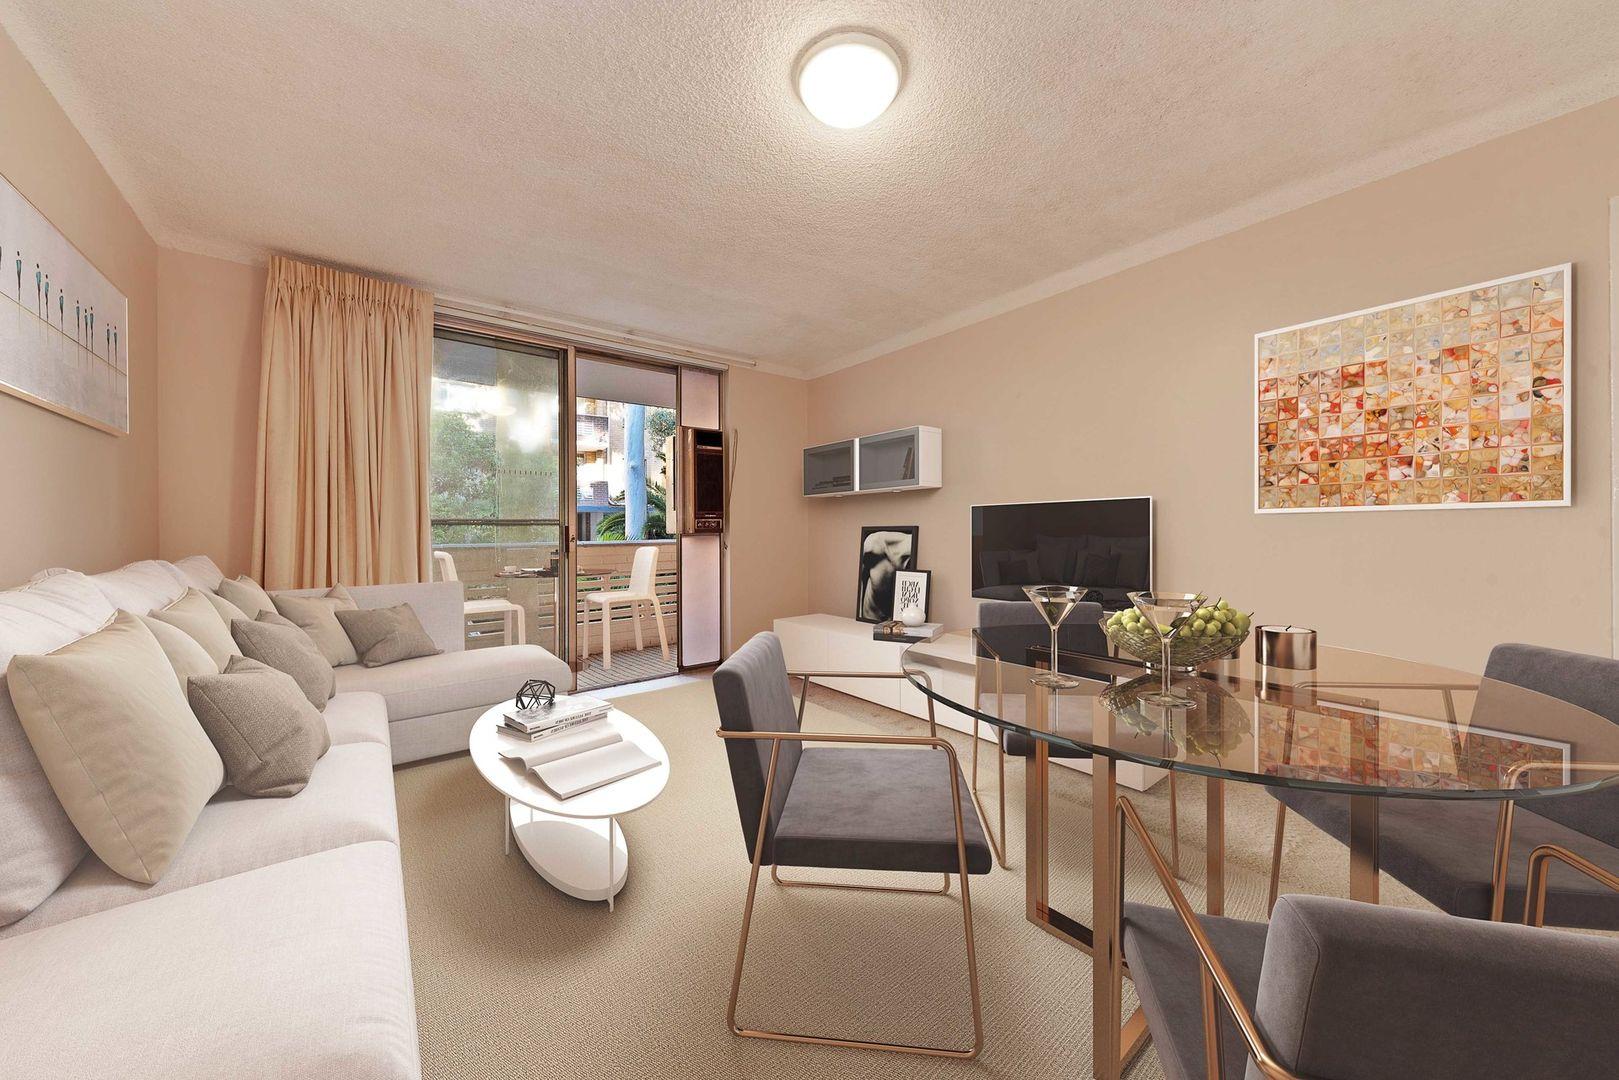 5/6 Murray Street, Lane Cove North NSW 2066, Image 1